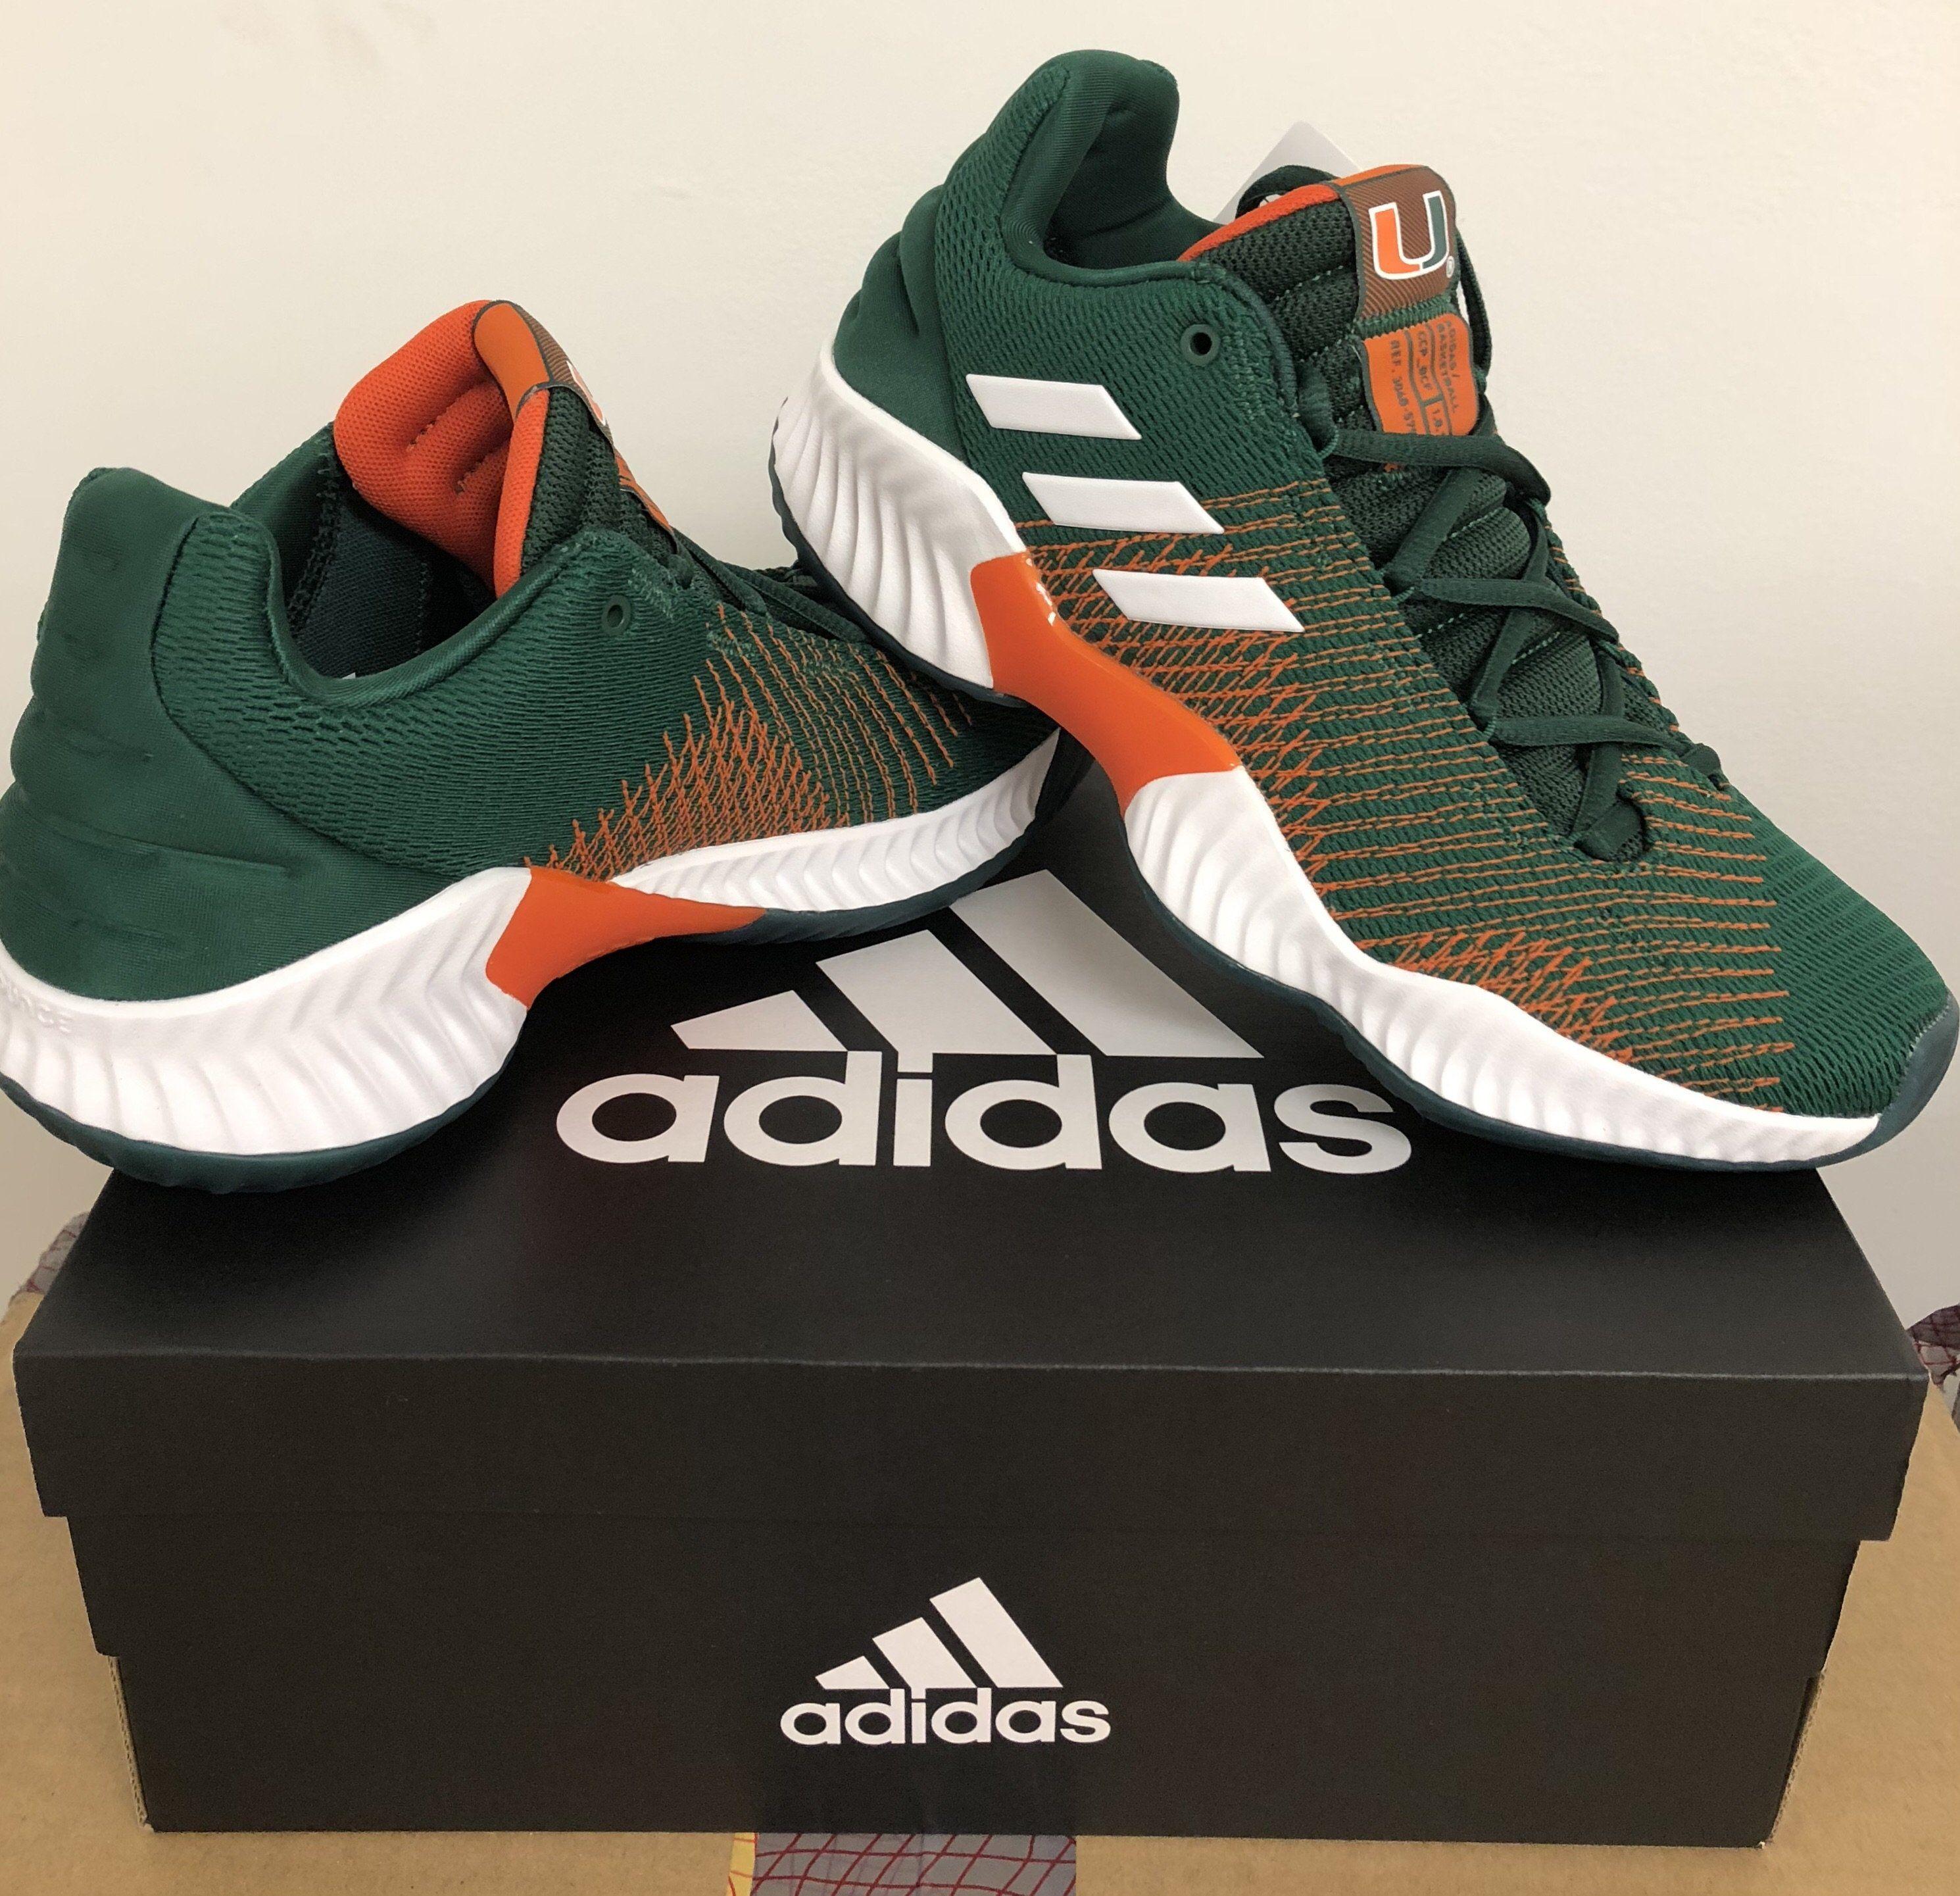 Miami Hurricanes adidas Pro Bounce Shoe Sneaker Green